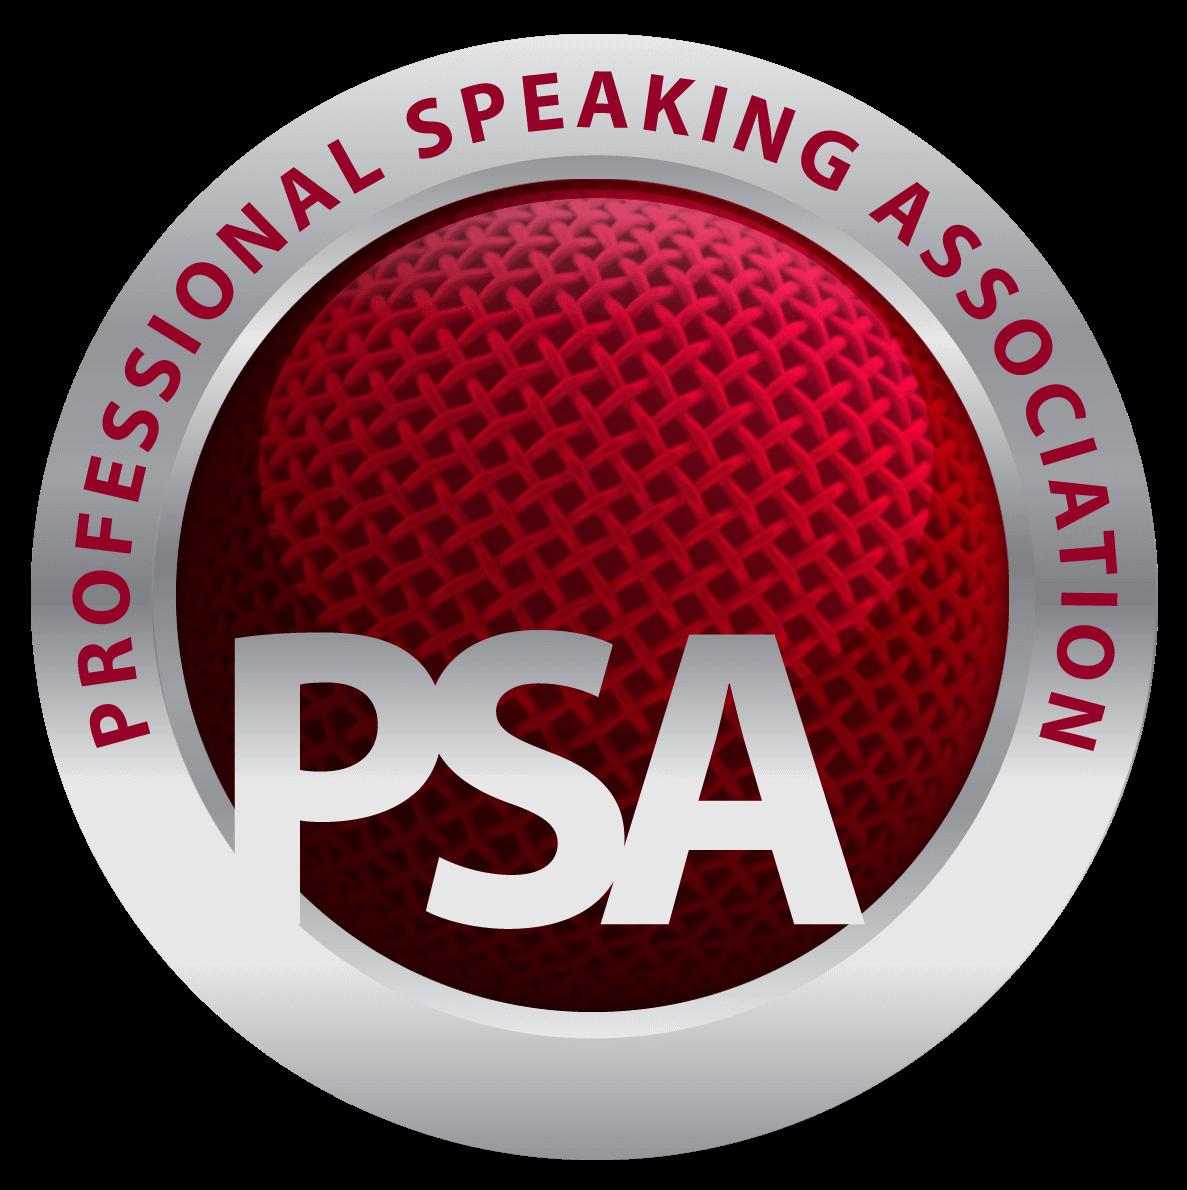 Professional Speaking Association